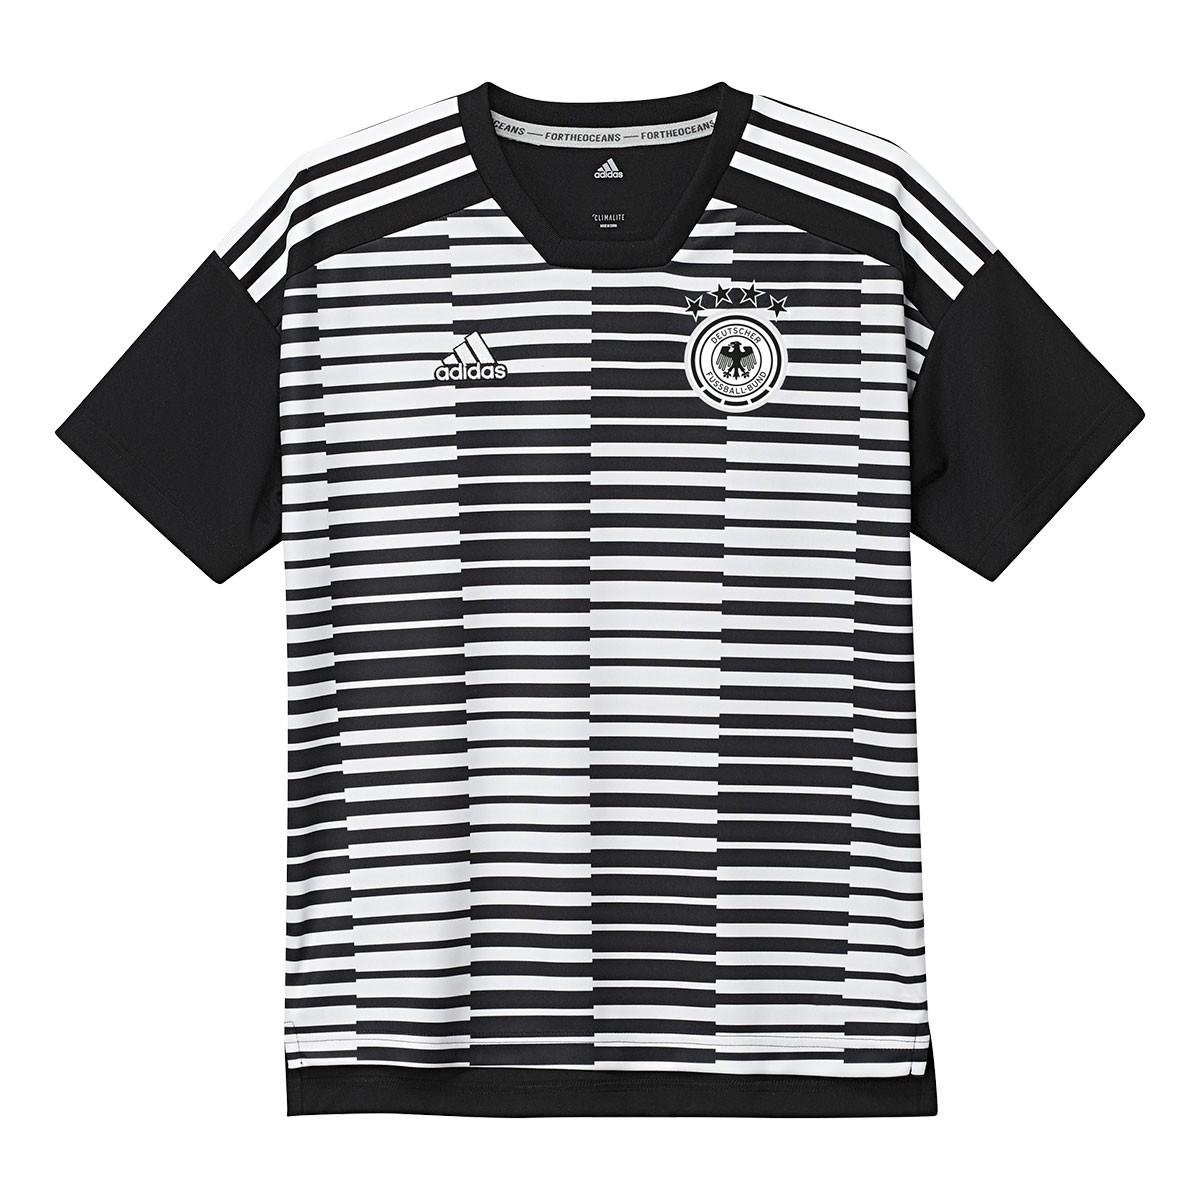 3dd888f4c10d3 Camiseta adidas Alemania Pre-Match 2017-2018 Niño White-Black - Tienda de fútbol  Fútbol Emotion